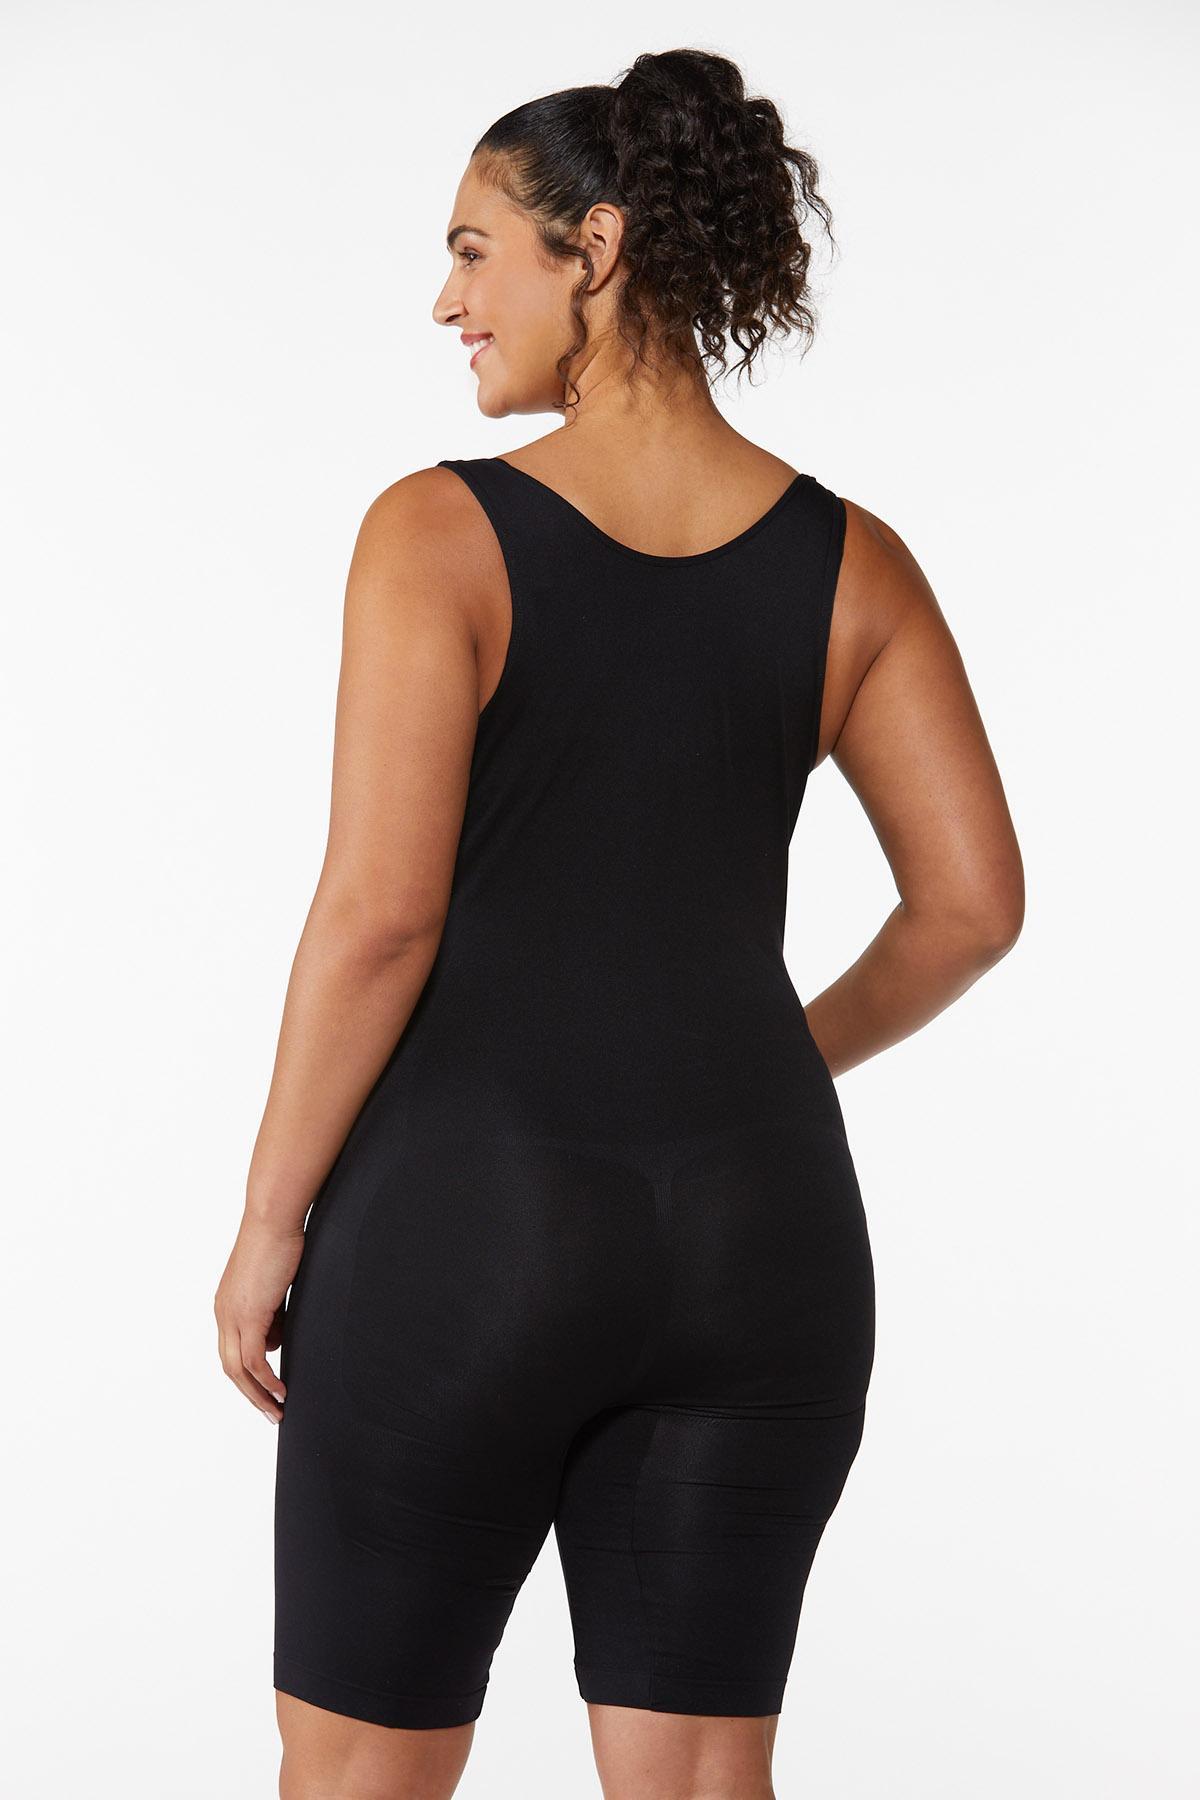 Plus Size Seamless Shaping Bodysuit (Item #43958333)